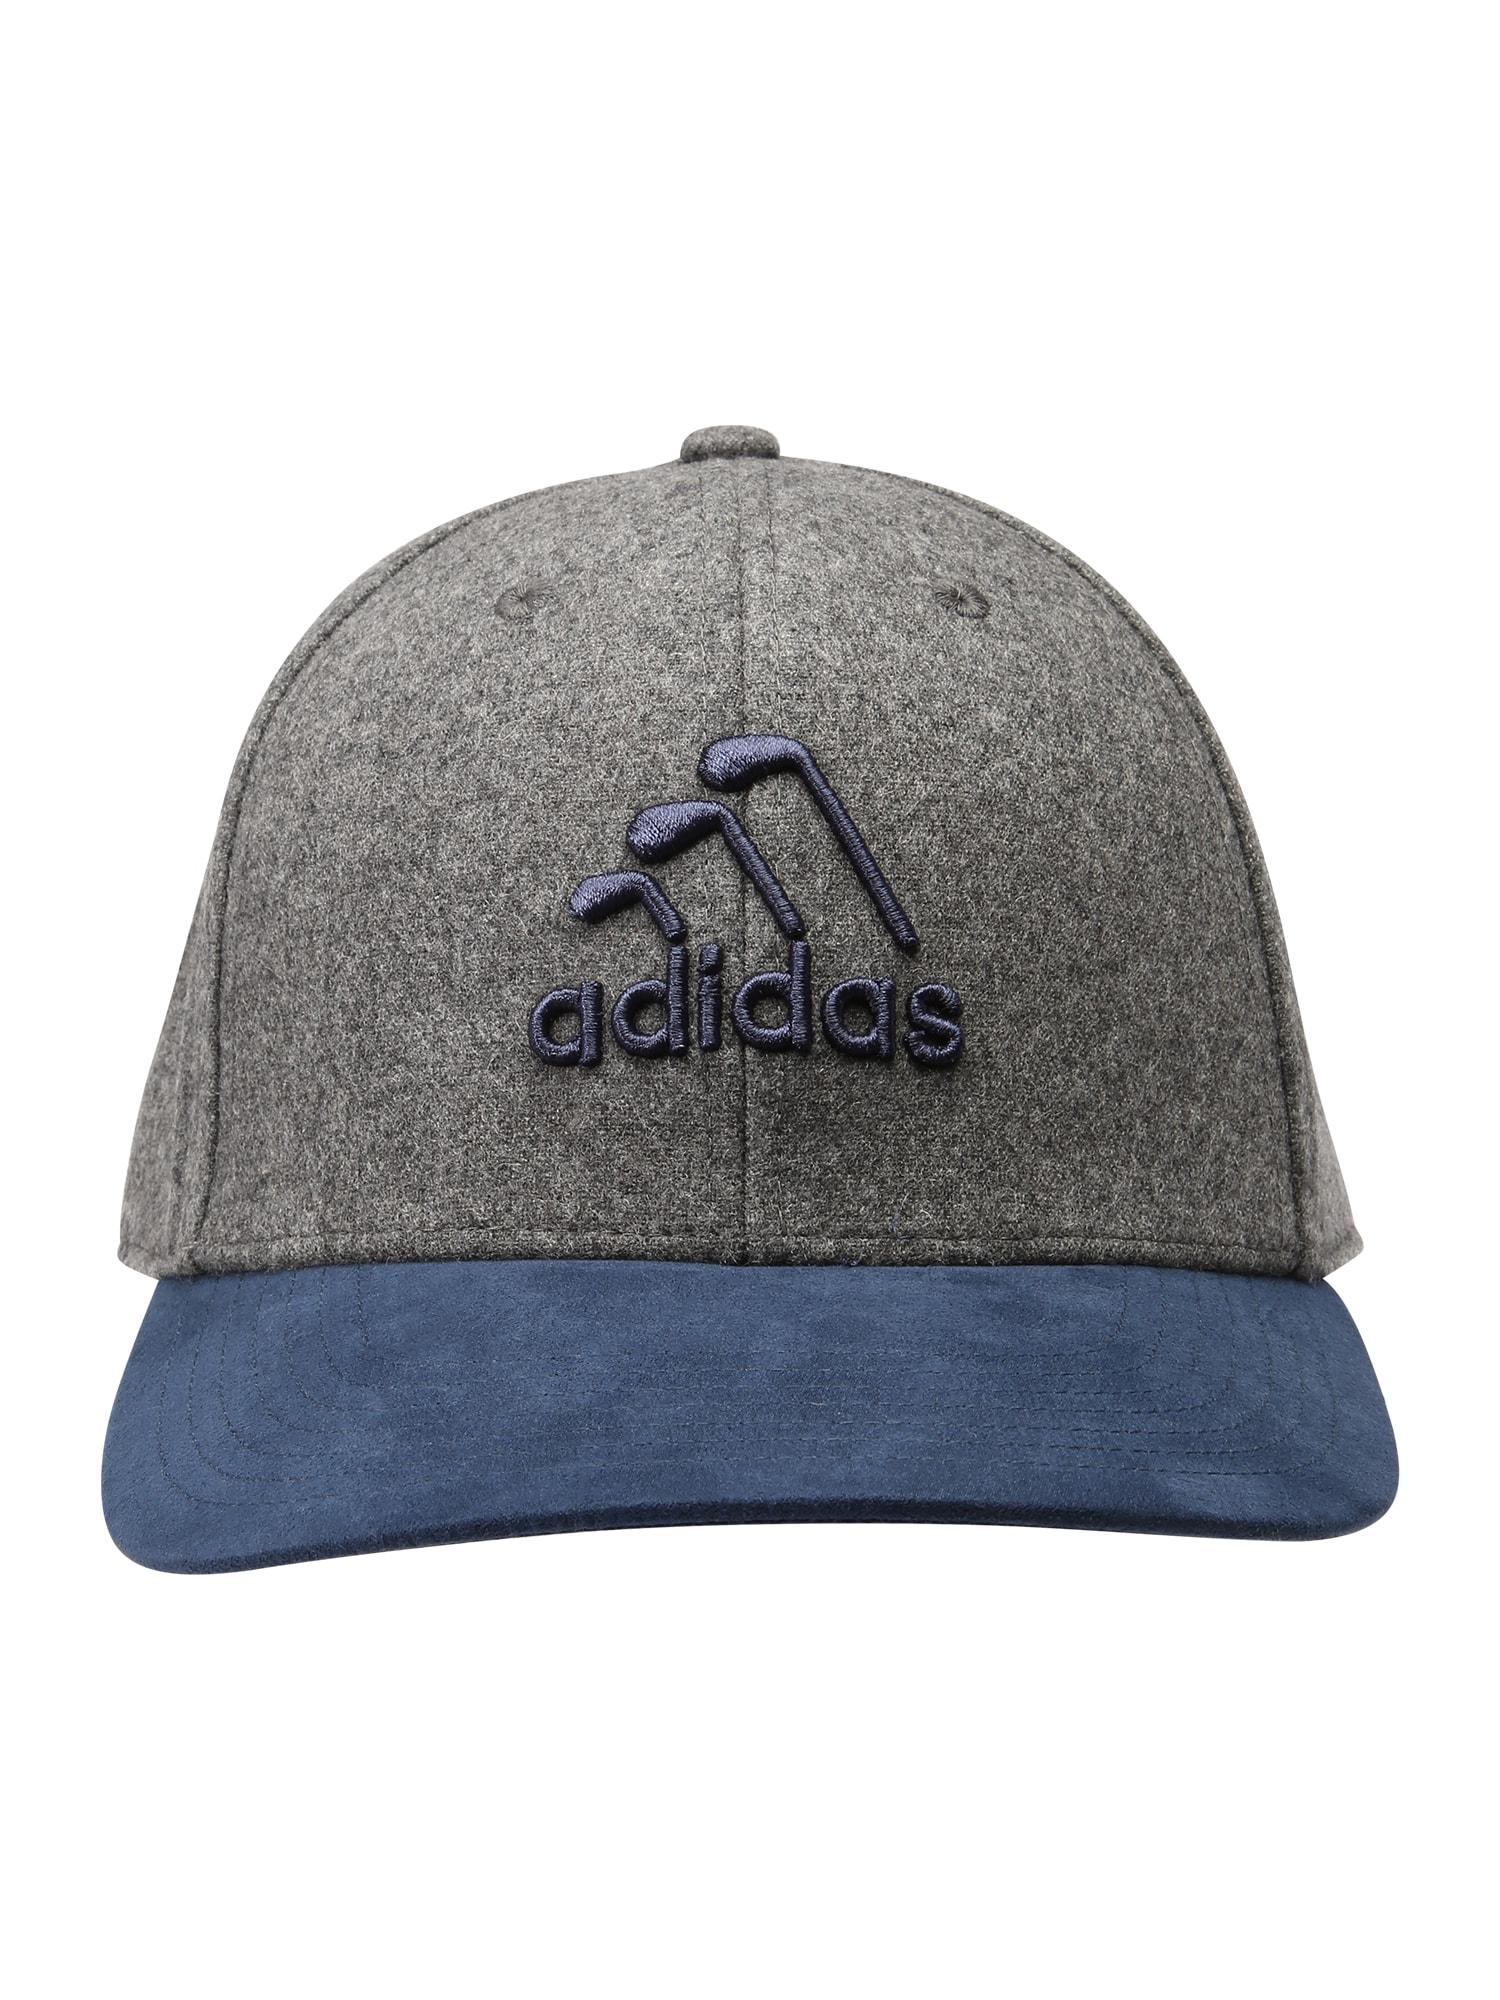 adidas Golf Sportinė kepurė pilka / melsvai pilka